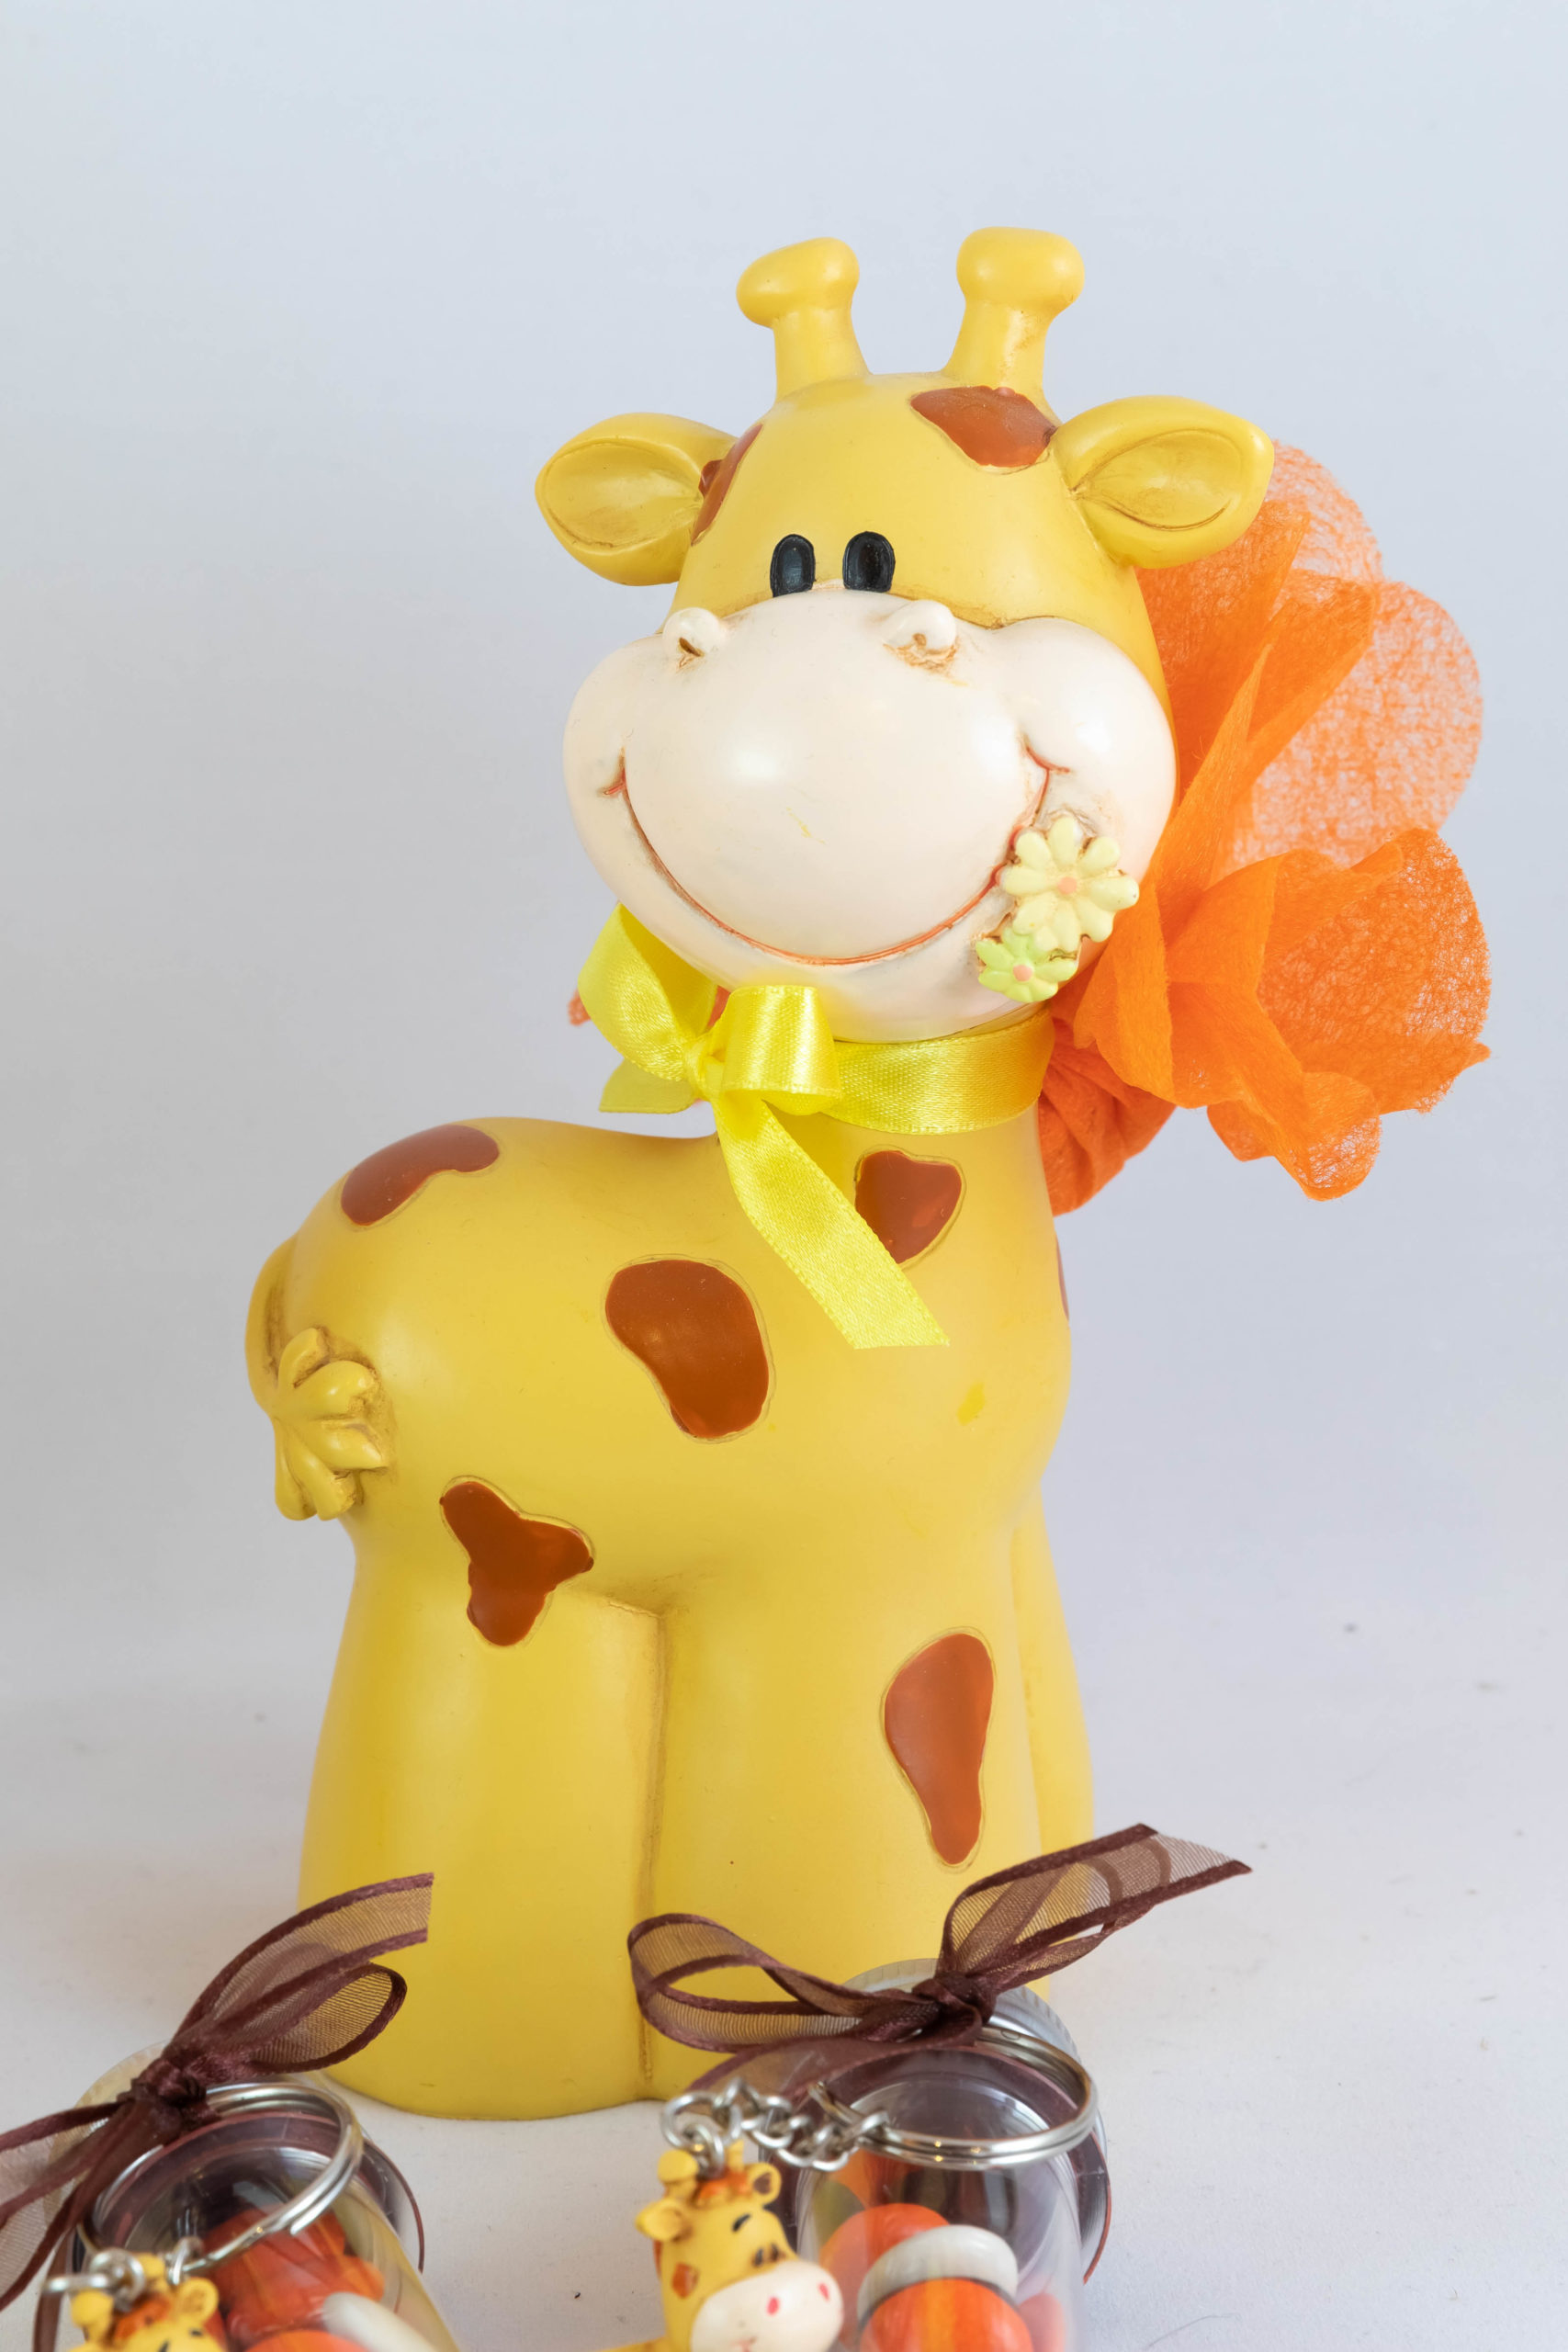 Tirelire - Girafe Image